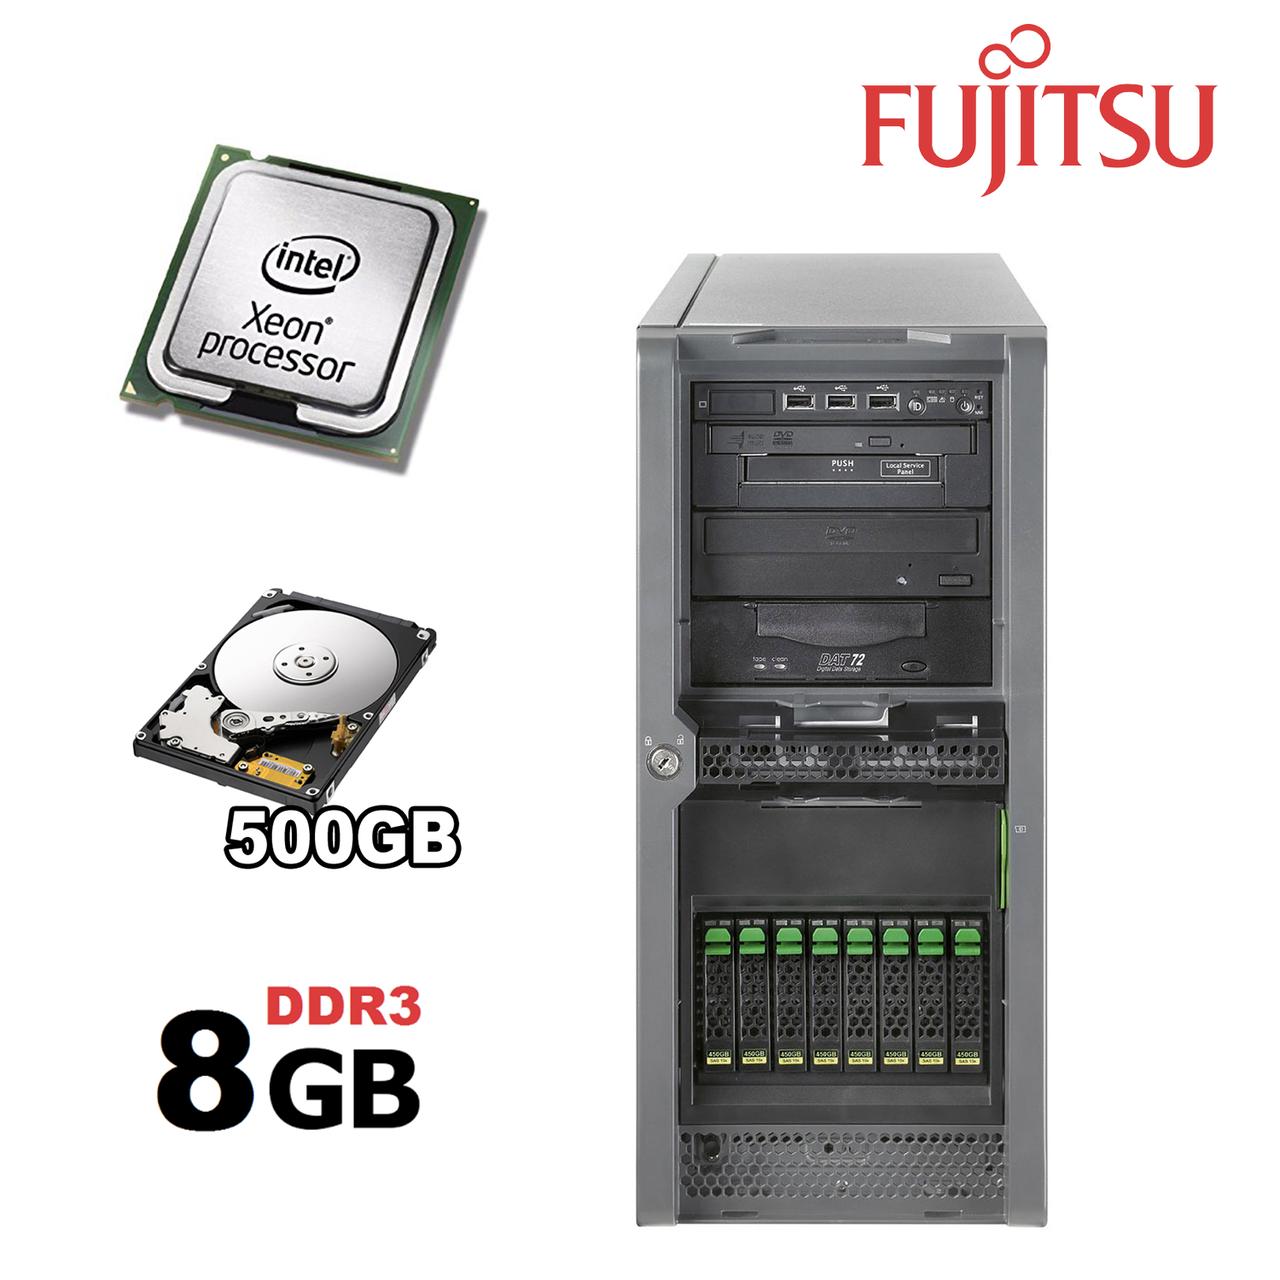 Сервер Fujitsu PRIMERGY TX150 S7/ Intel Xeon X3430 (4 ядра по 2,4 - 2,8 GHz) / 8 GB DDR3/ 500 GB HDD/ Chipset Intel® 3420 ( 6 слотов под память ) /